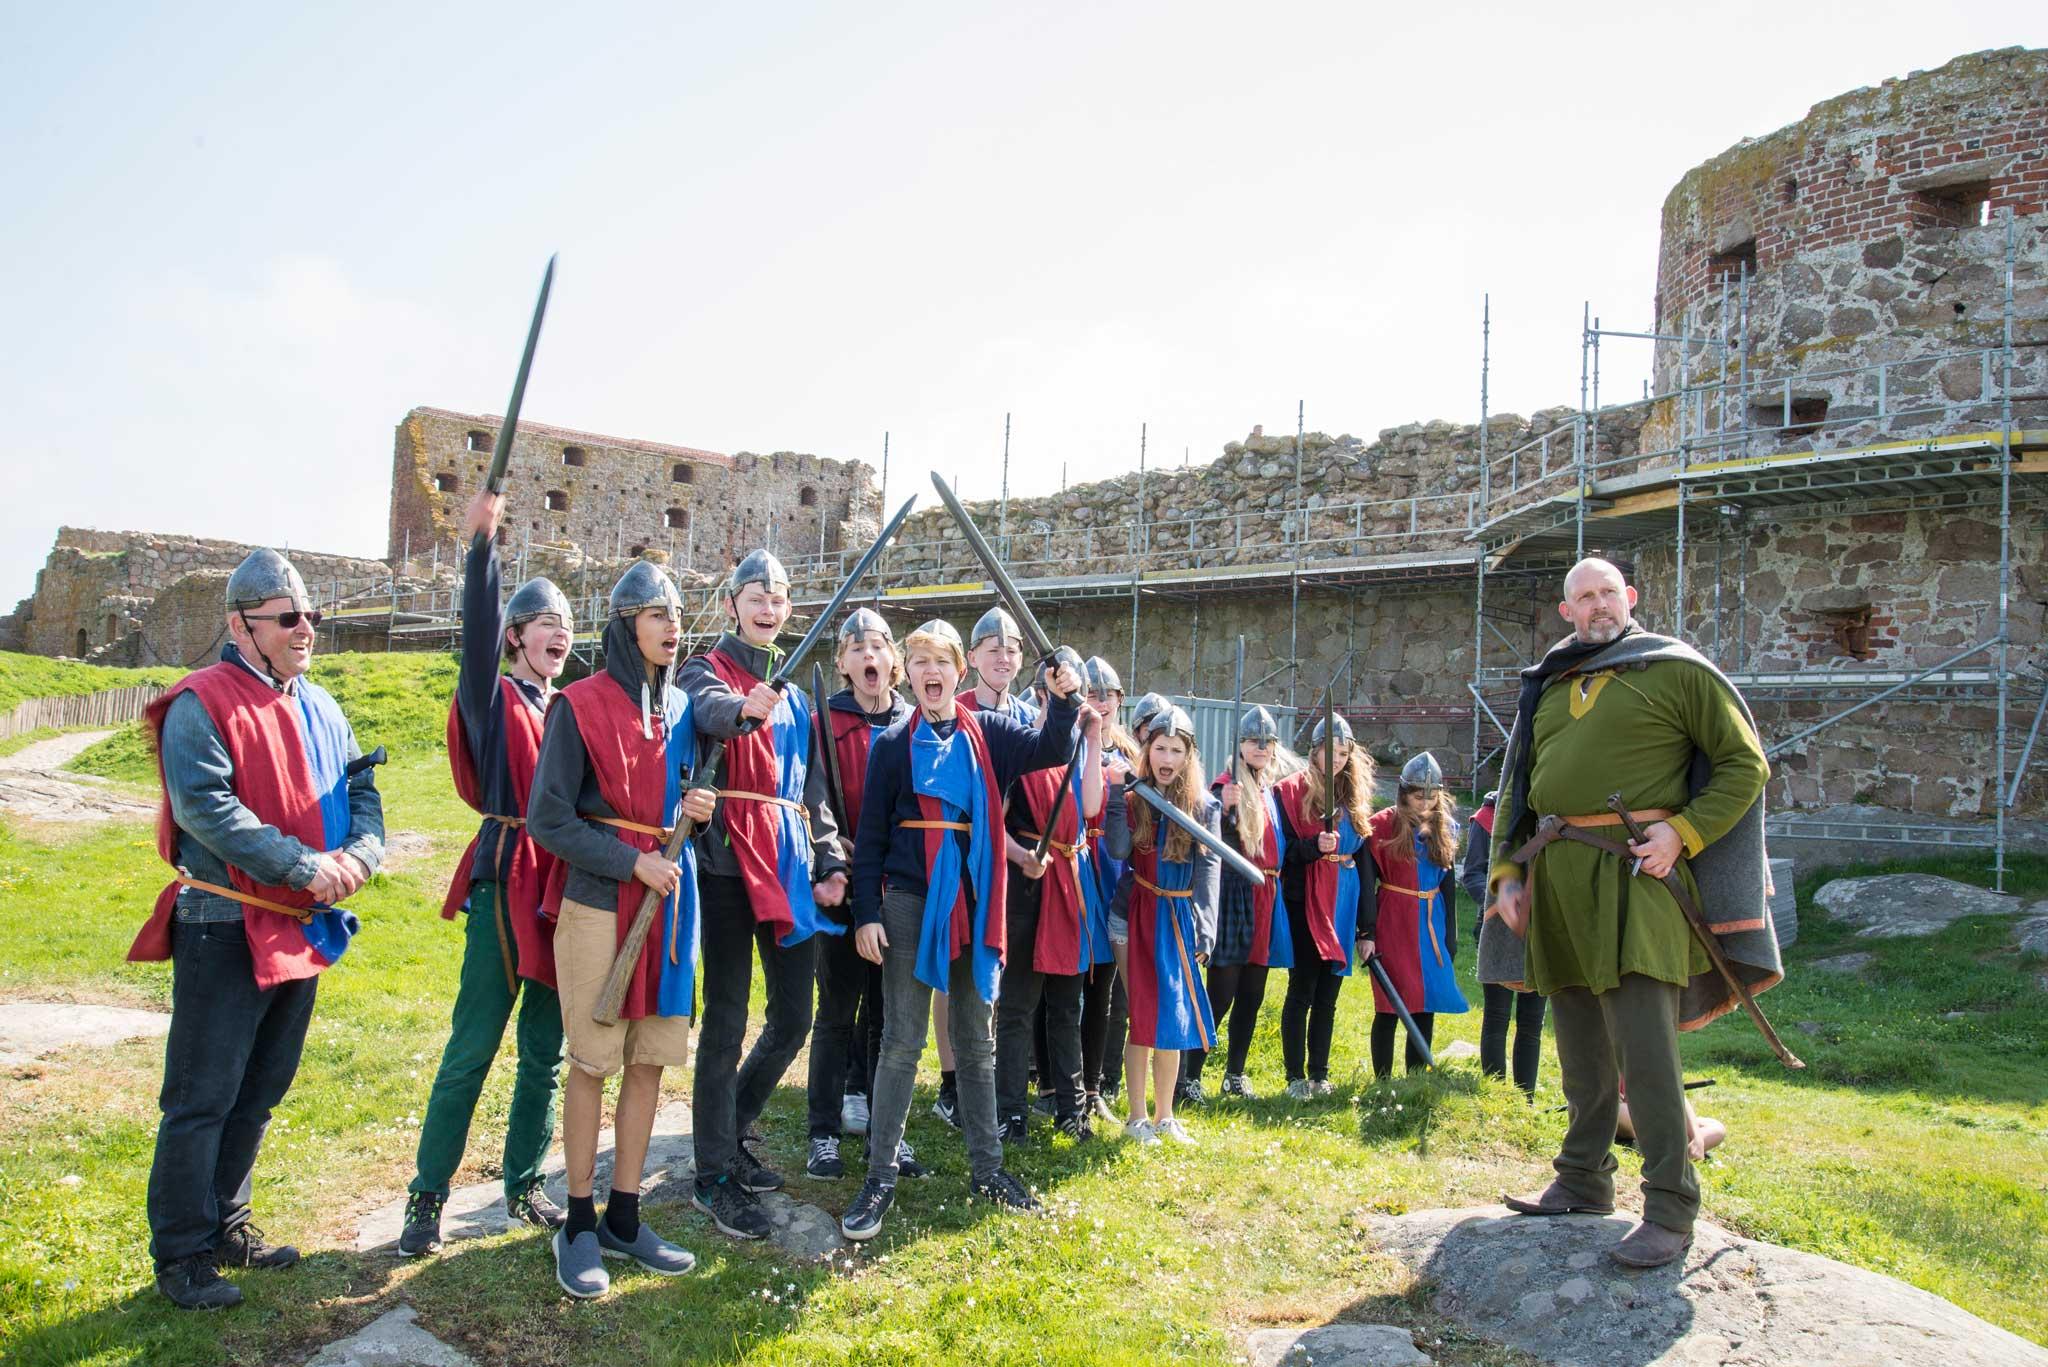 Mange skoleklasser besøker Hammersholm og lærer historie med blant annet rollespill.